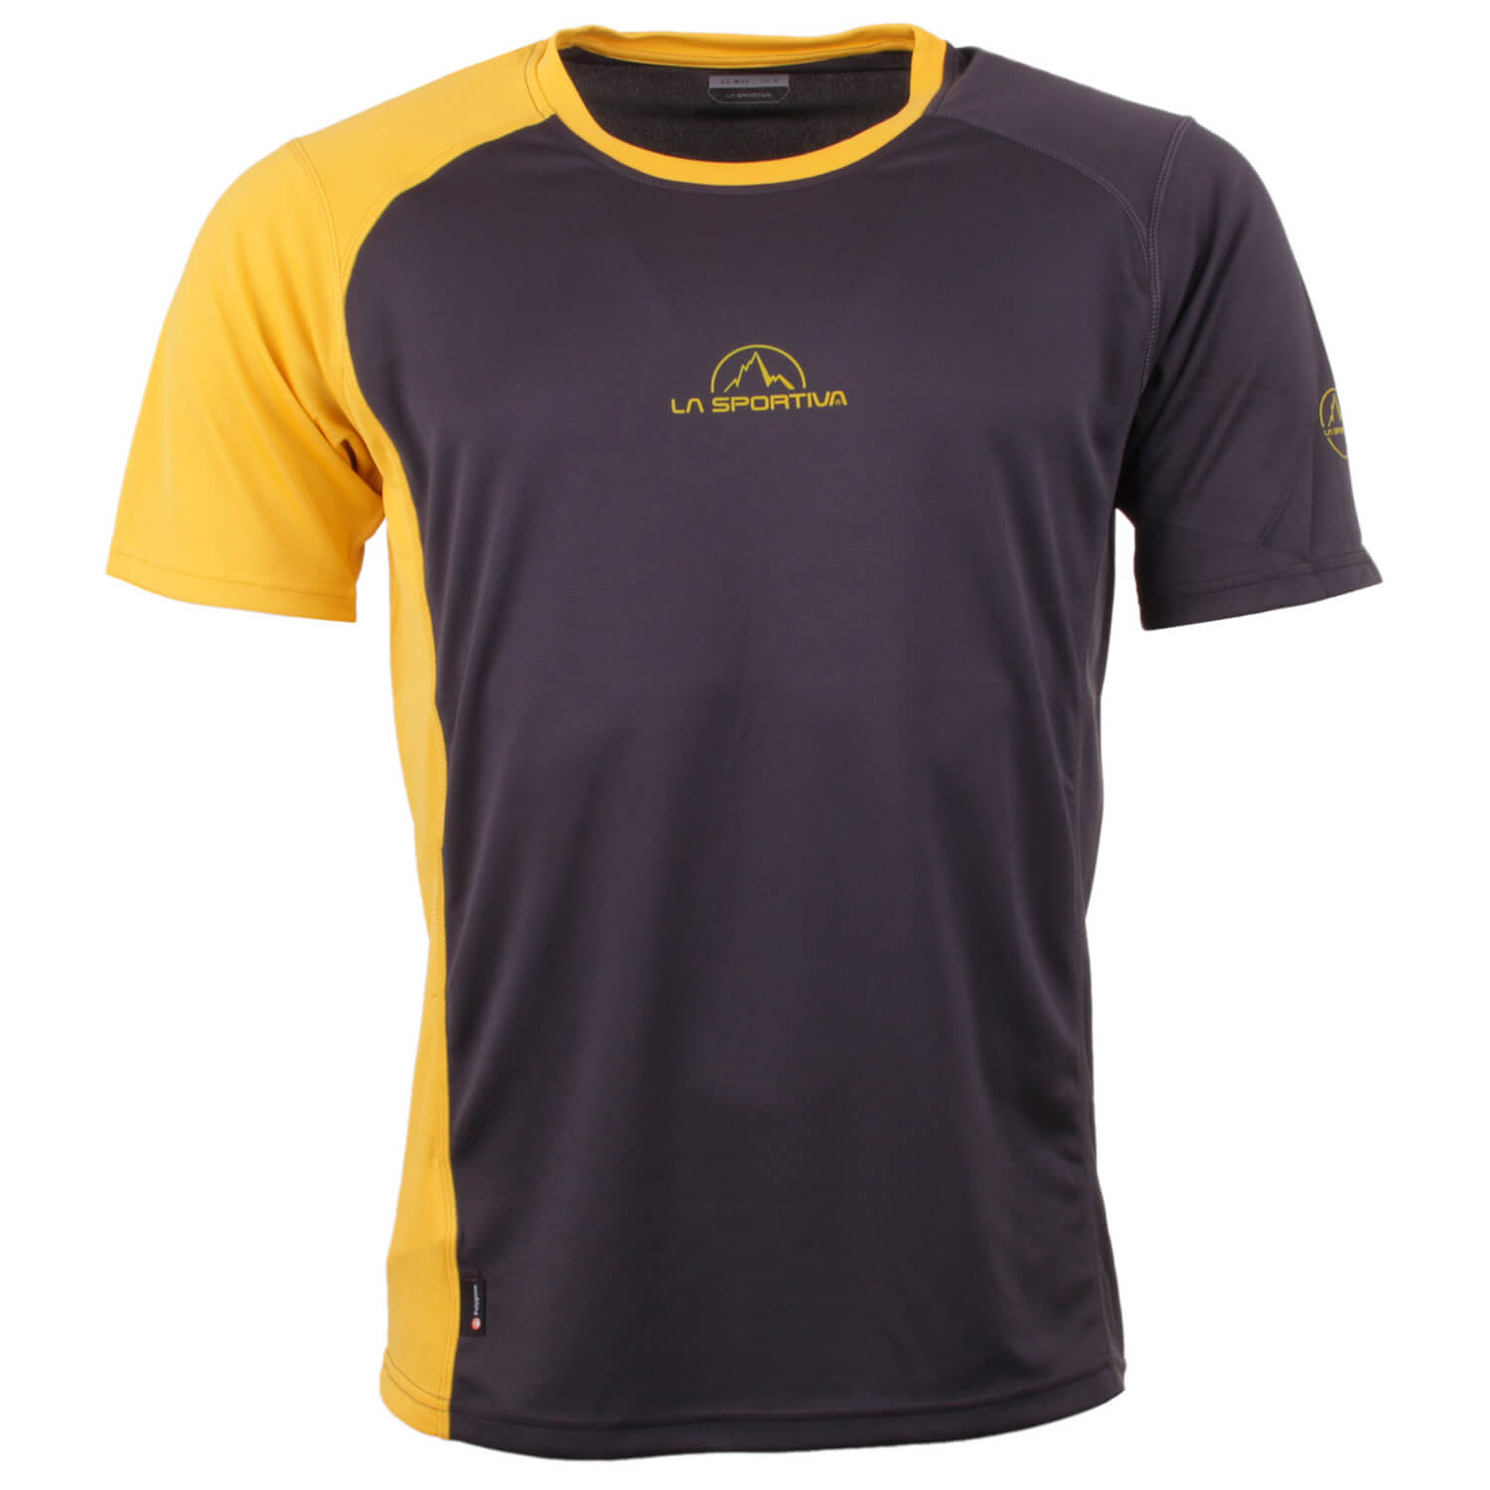 ... La Sportiva - MR Event Tee - Camiseta de running ... cf020580ba7